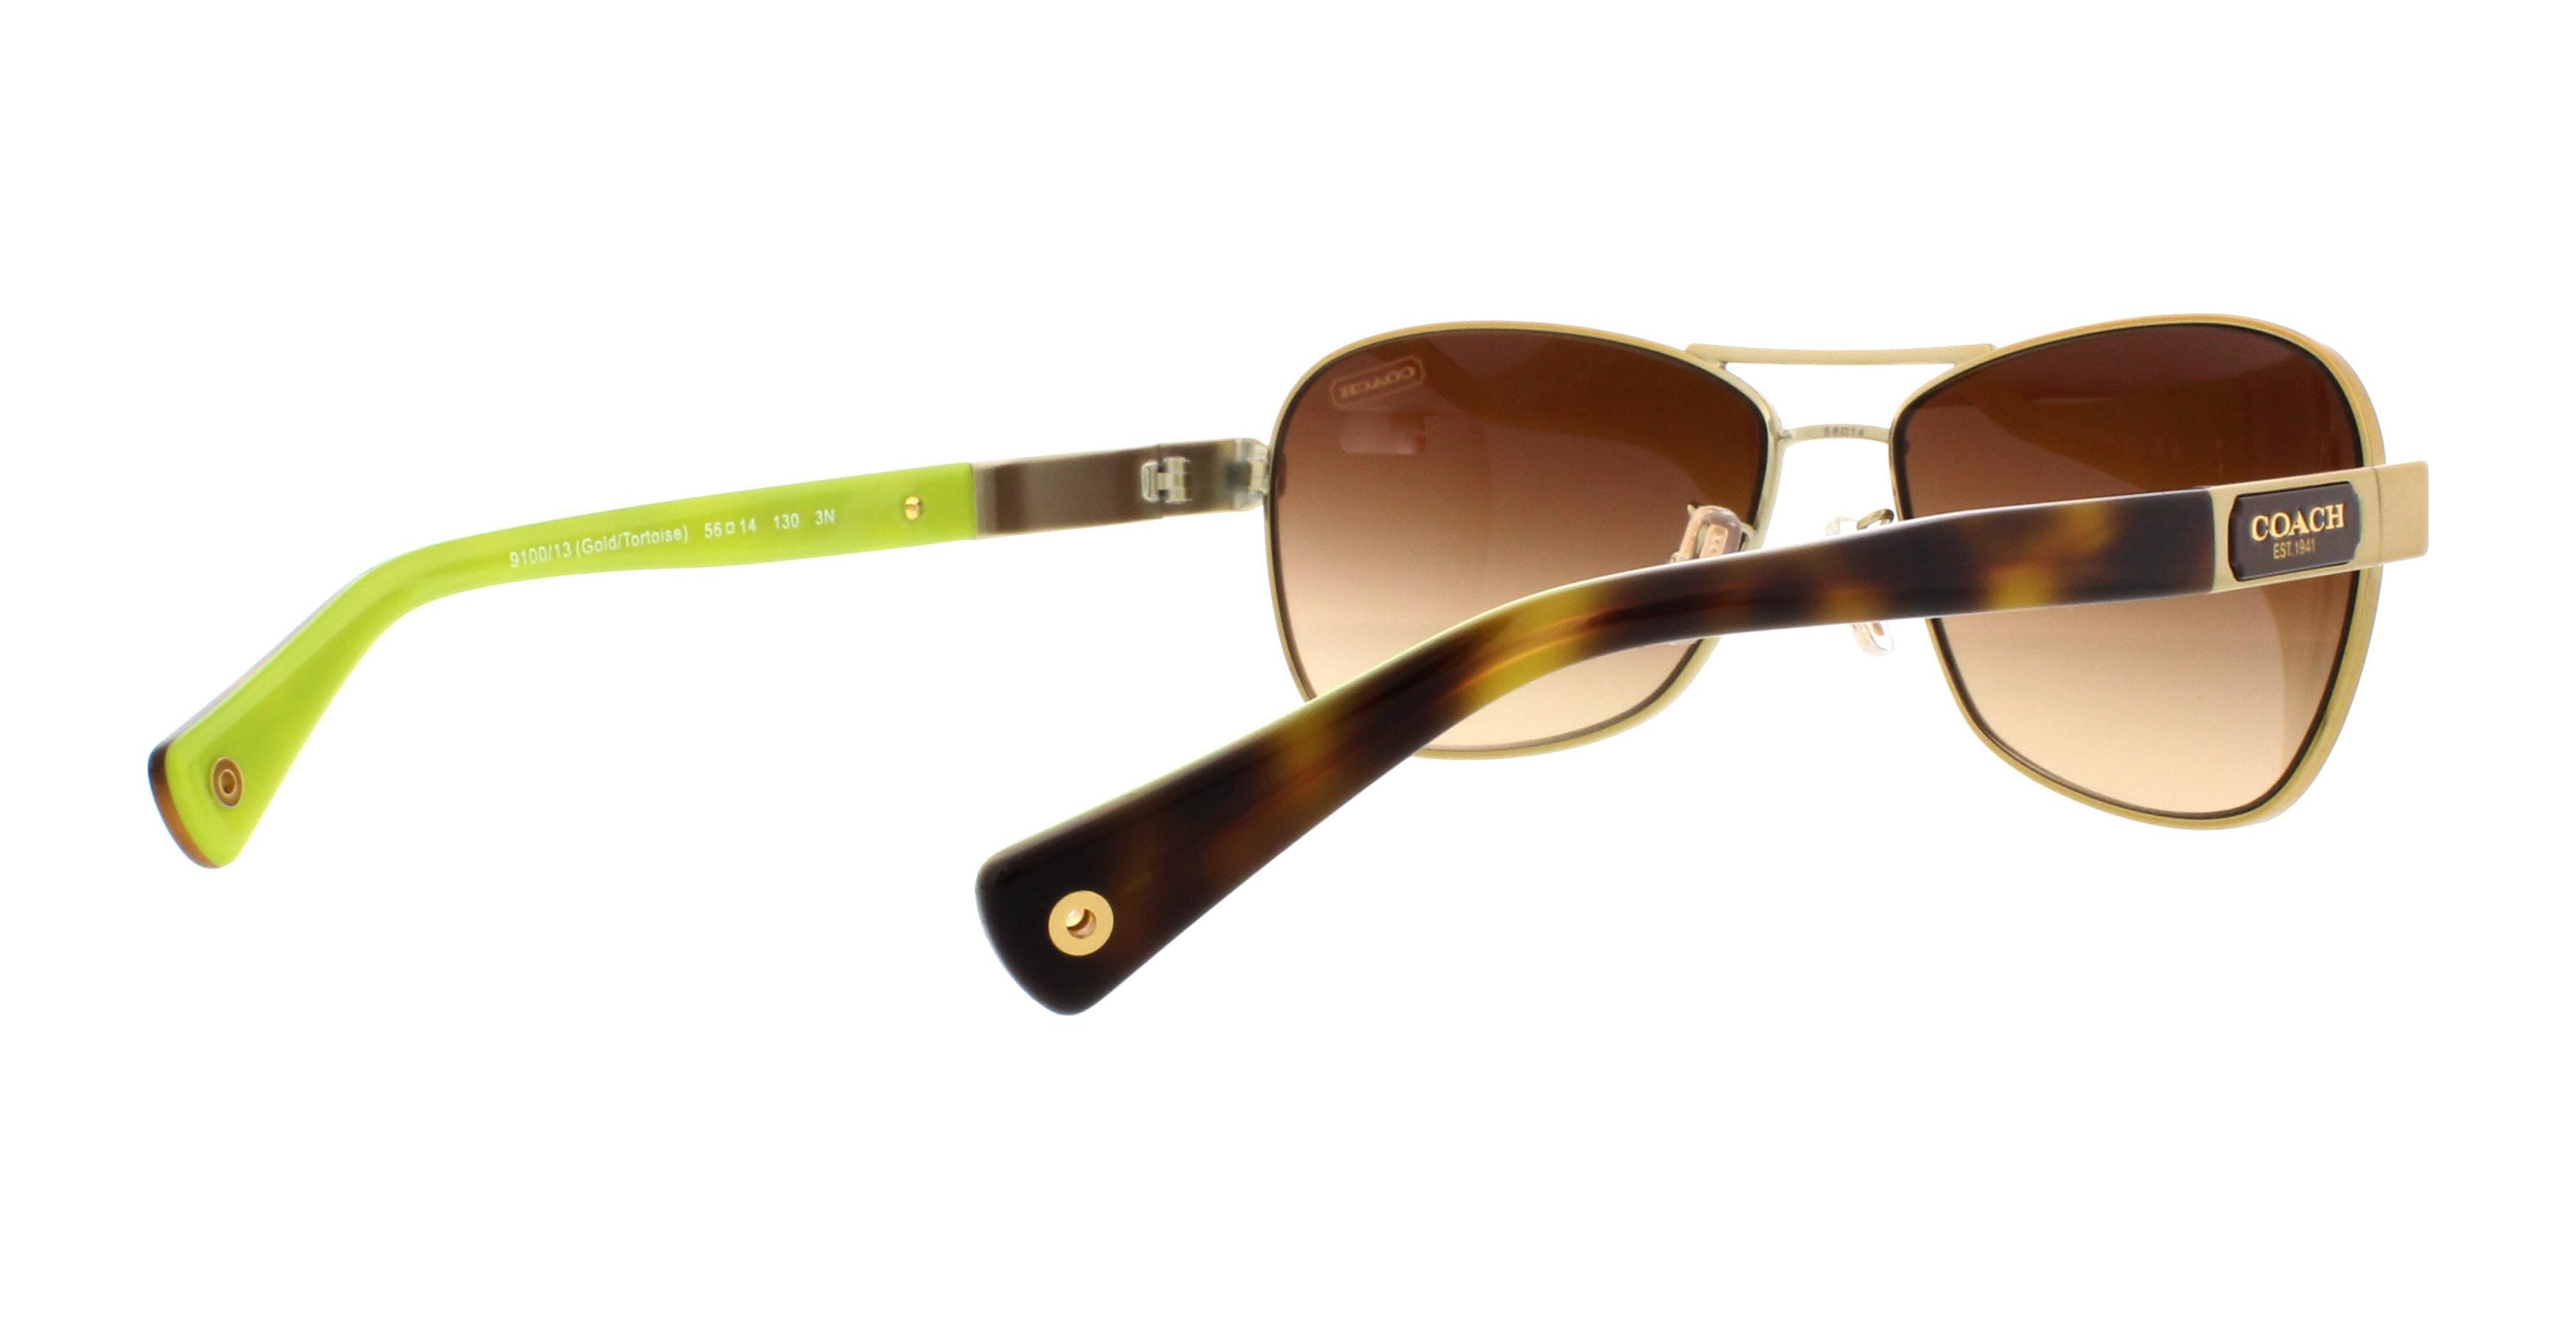 6a8a9ca3cb92 uk coach coach gold tortoise aviator sunglasses 1c478 de2cd; coupon code  for picture of coach sunglasses hc7012 l038 caroline cce37 37ced